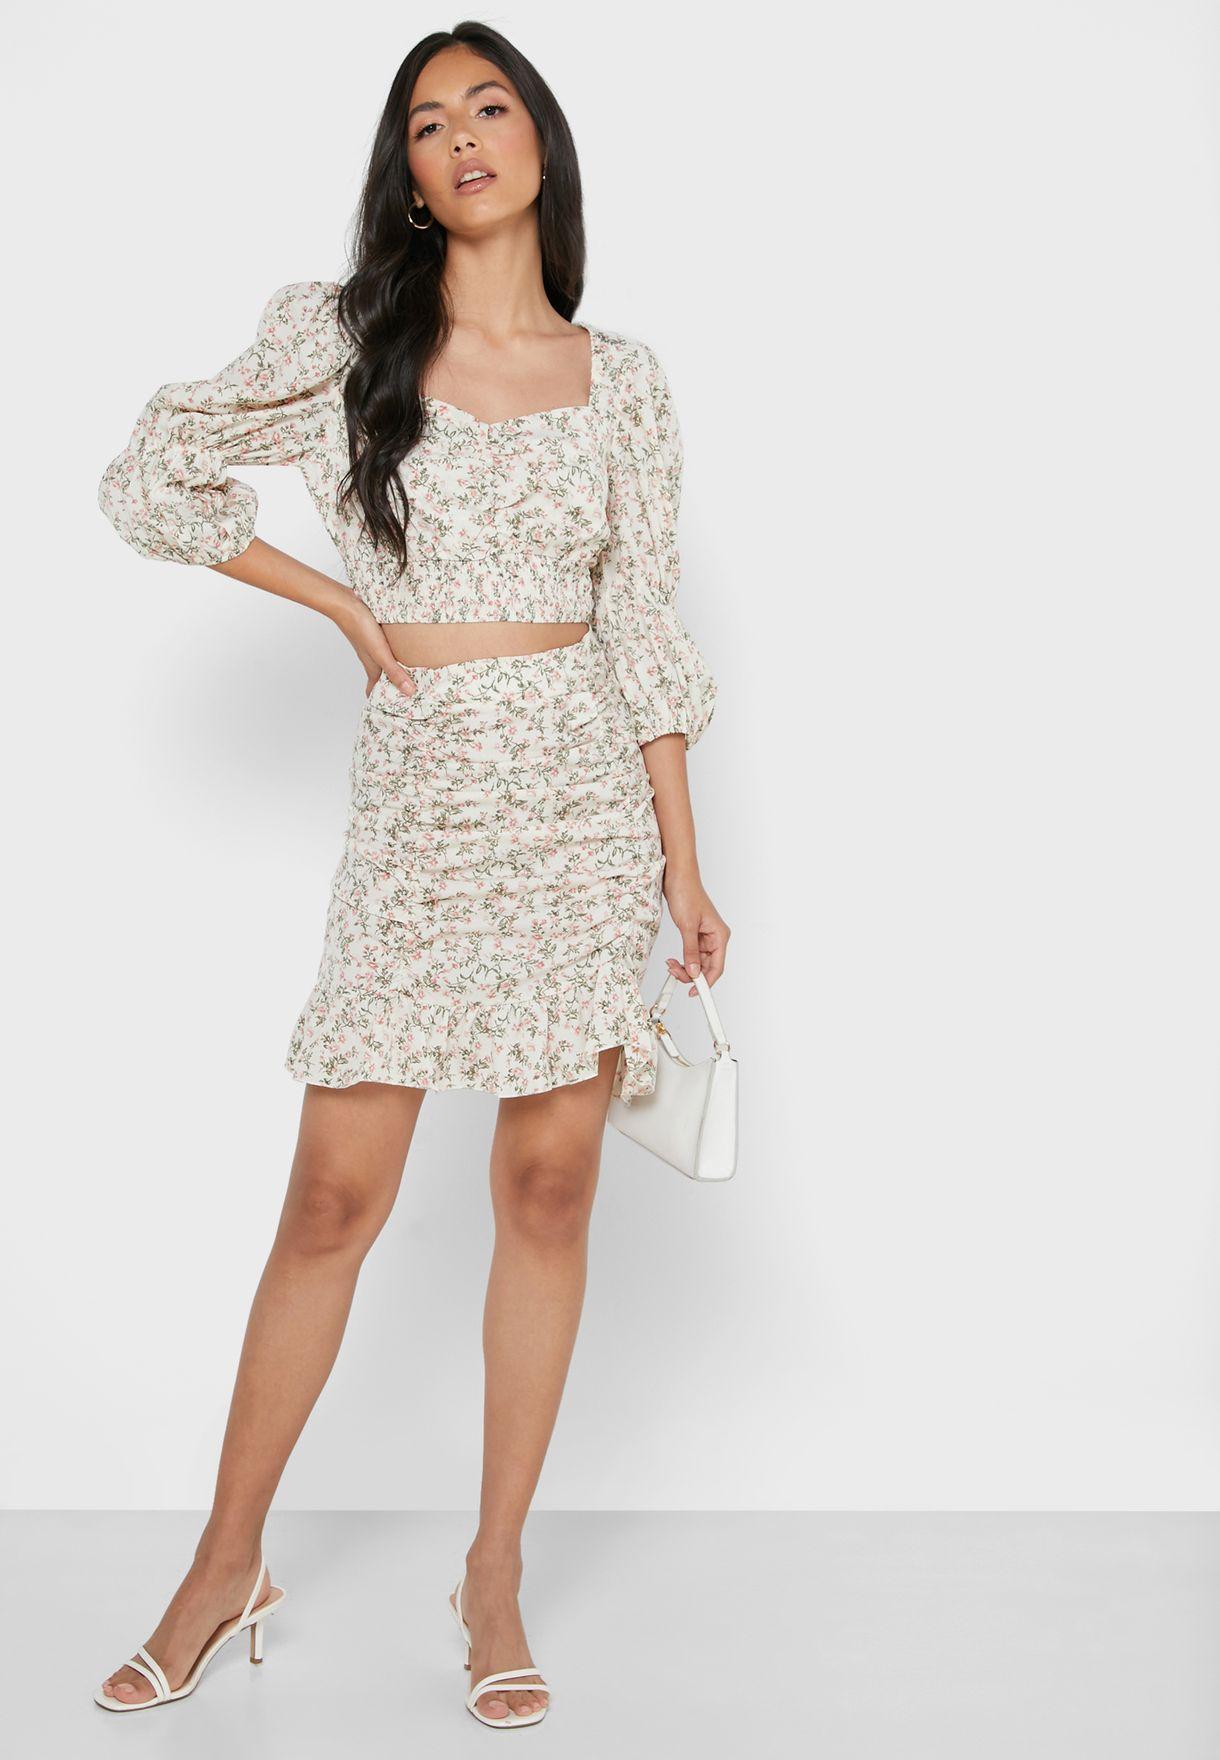 Floral Print Puffed Sleeve Mini Skirt Set